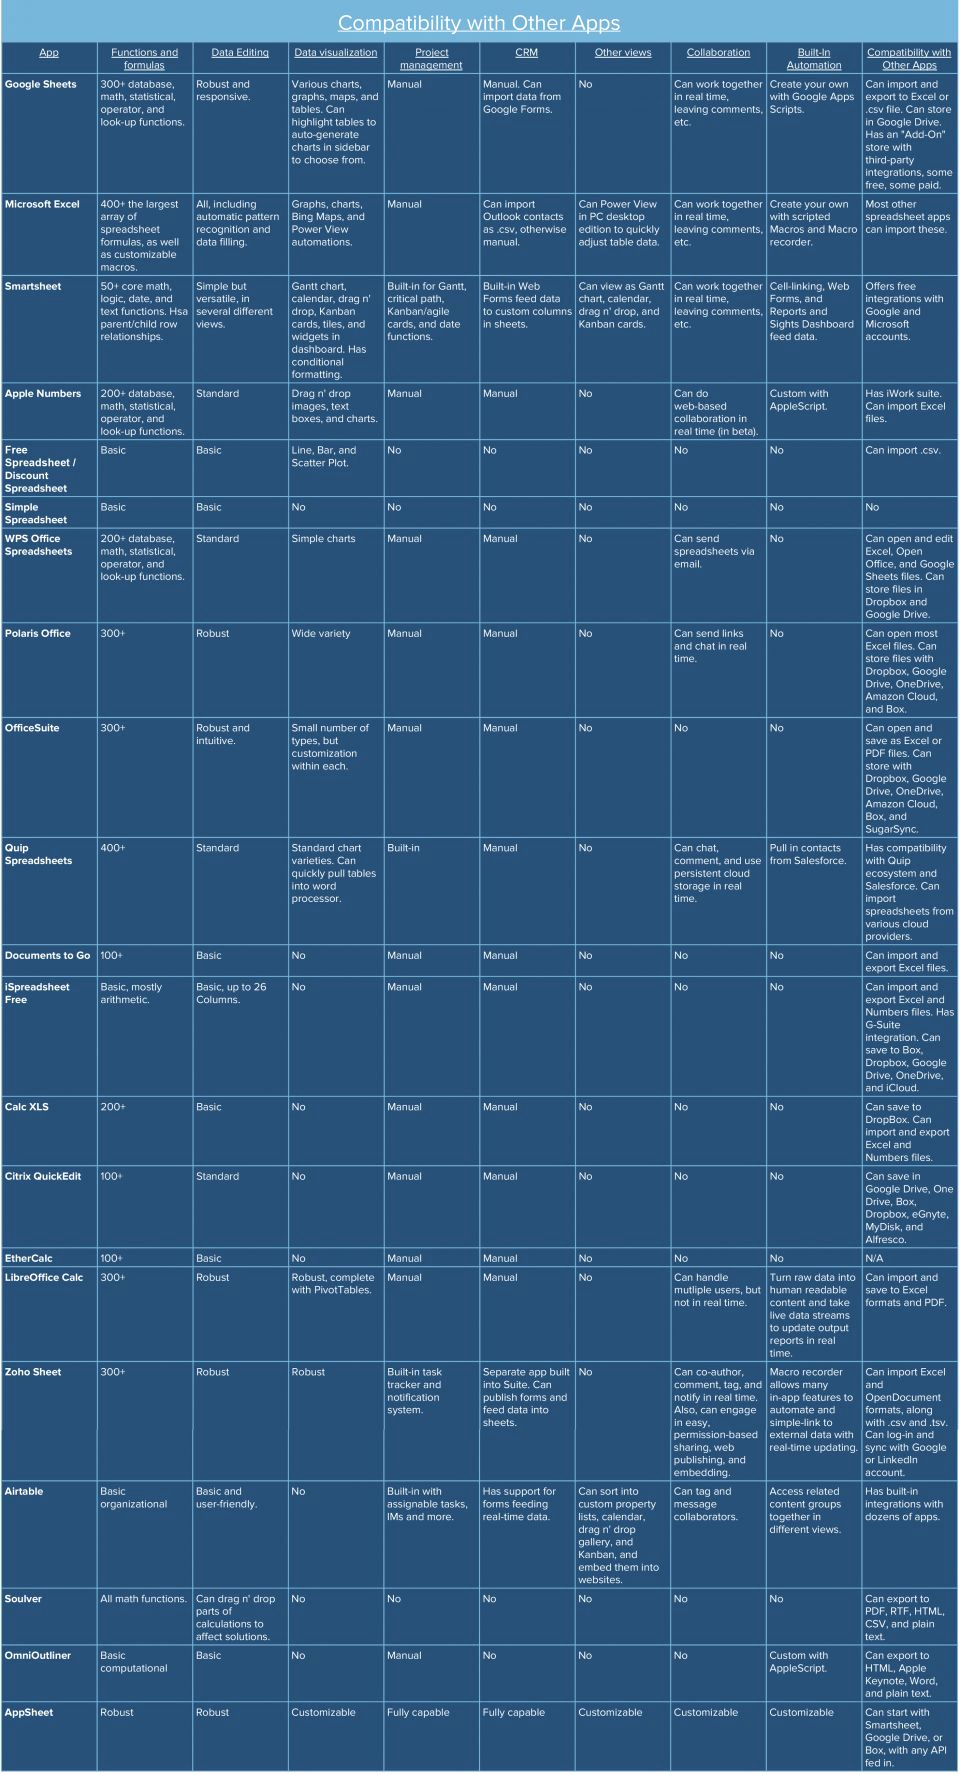 Best Free Spreadsheet App With Regard To Best Free Spreadsheet App And Best Free Spreadsheet App For Ipad